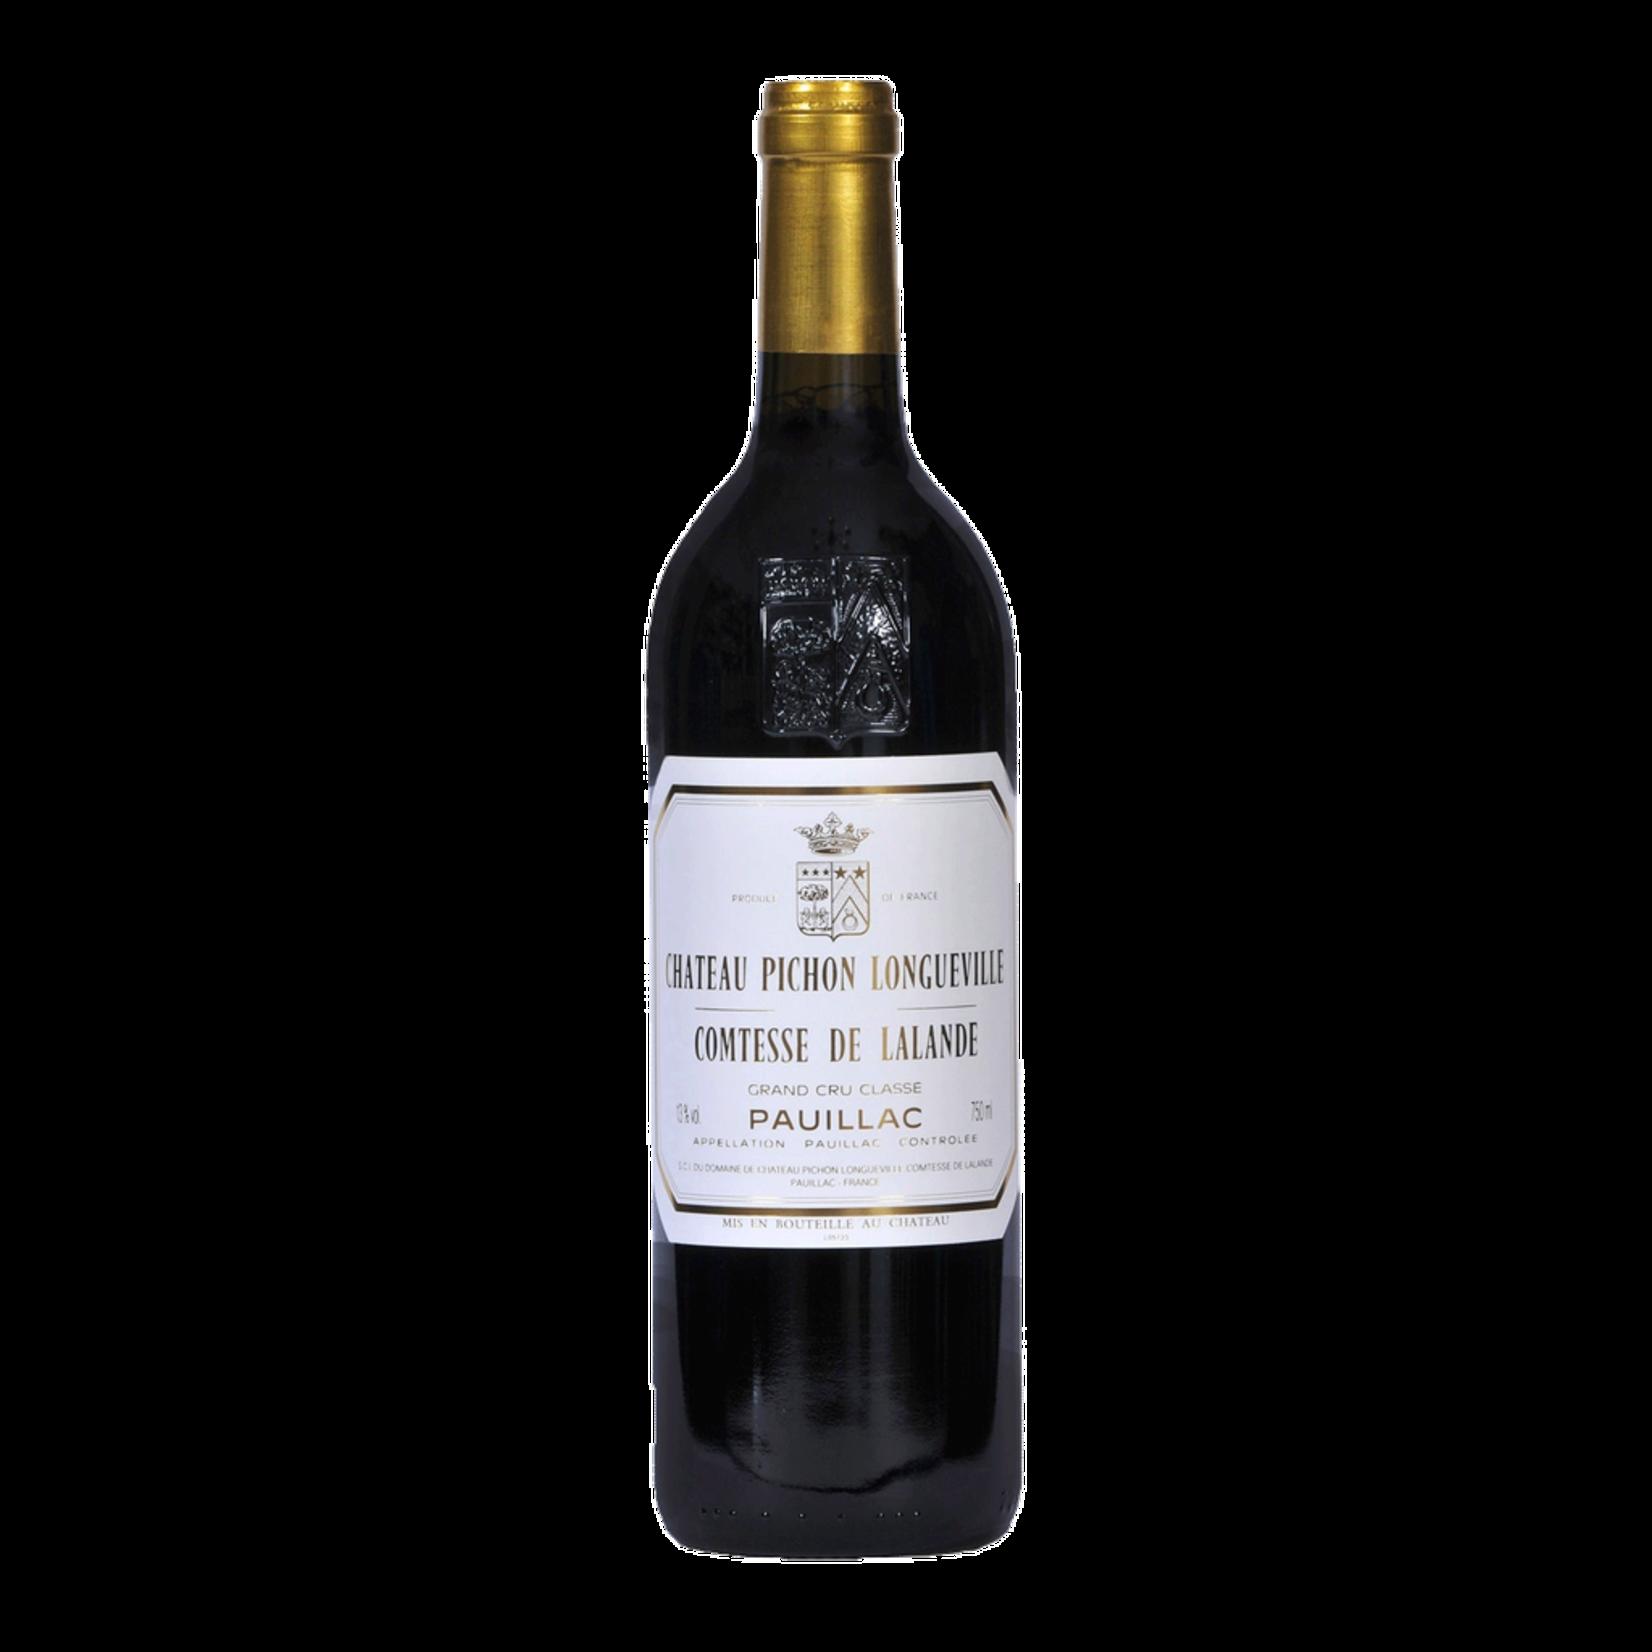 Wine Chateau Pichon Comtesse Lalande 2009